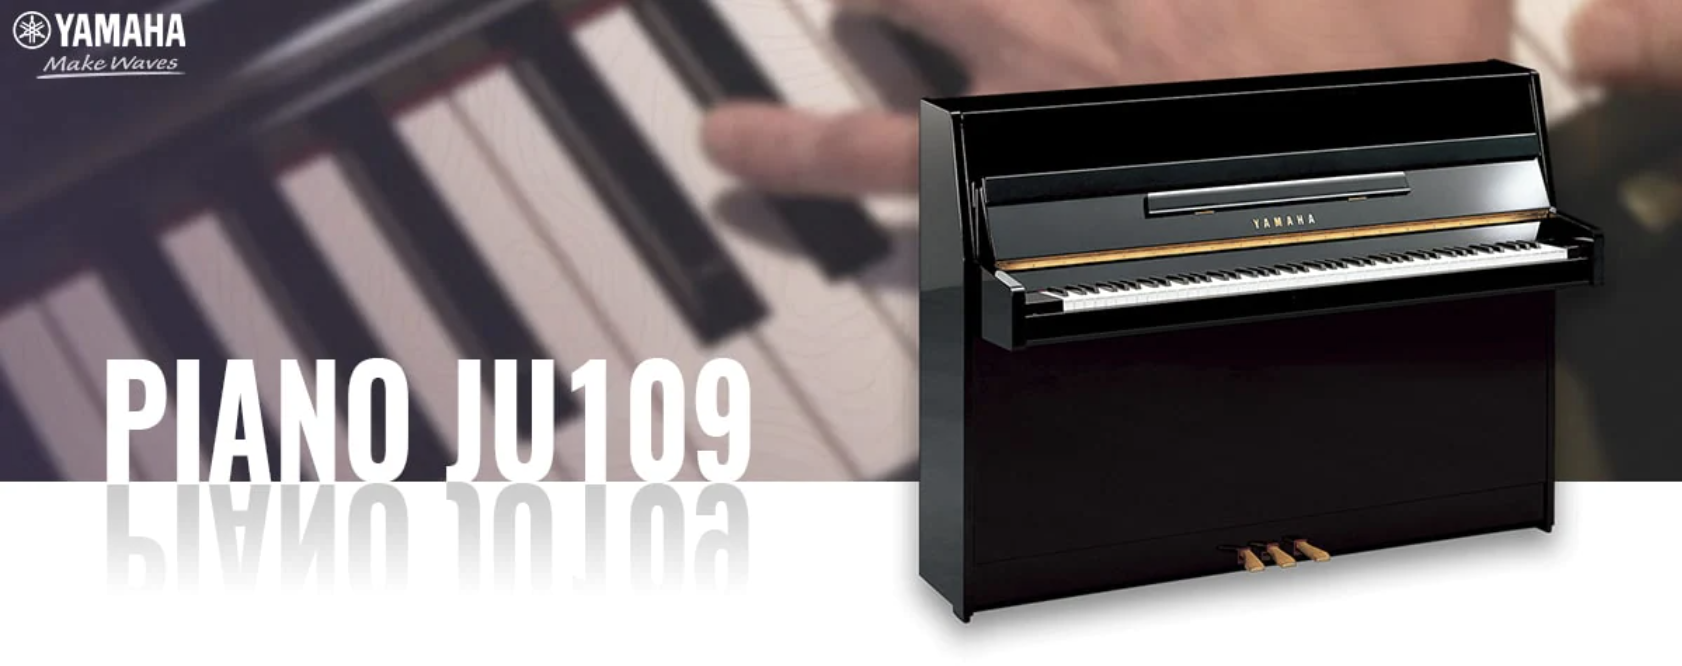 bang-gia-10-cay-dan-piano-co-dang-mua-nhat-nam-2021-yamaha-ju109-pe-1